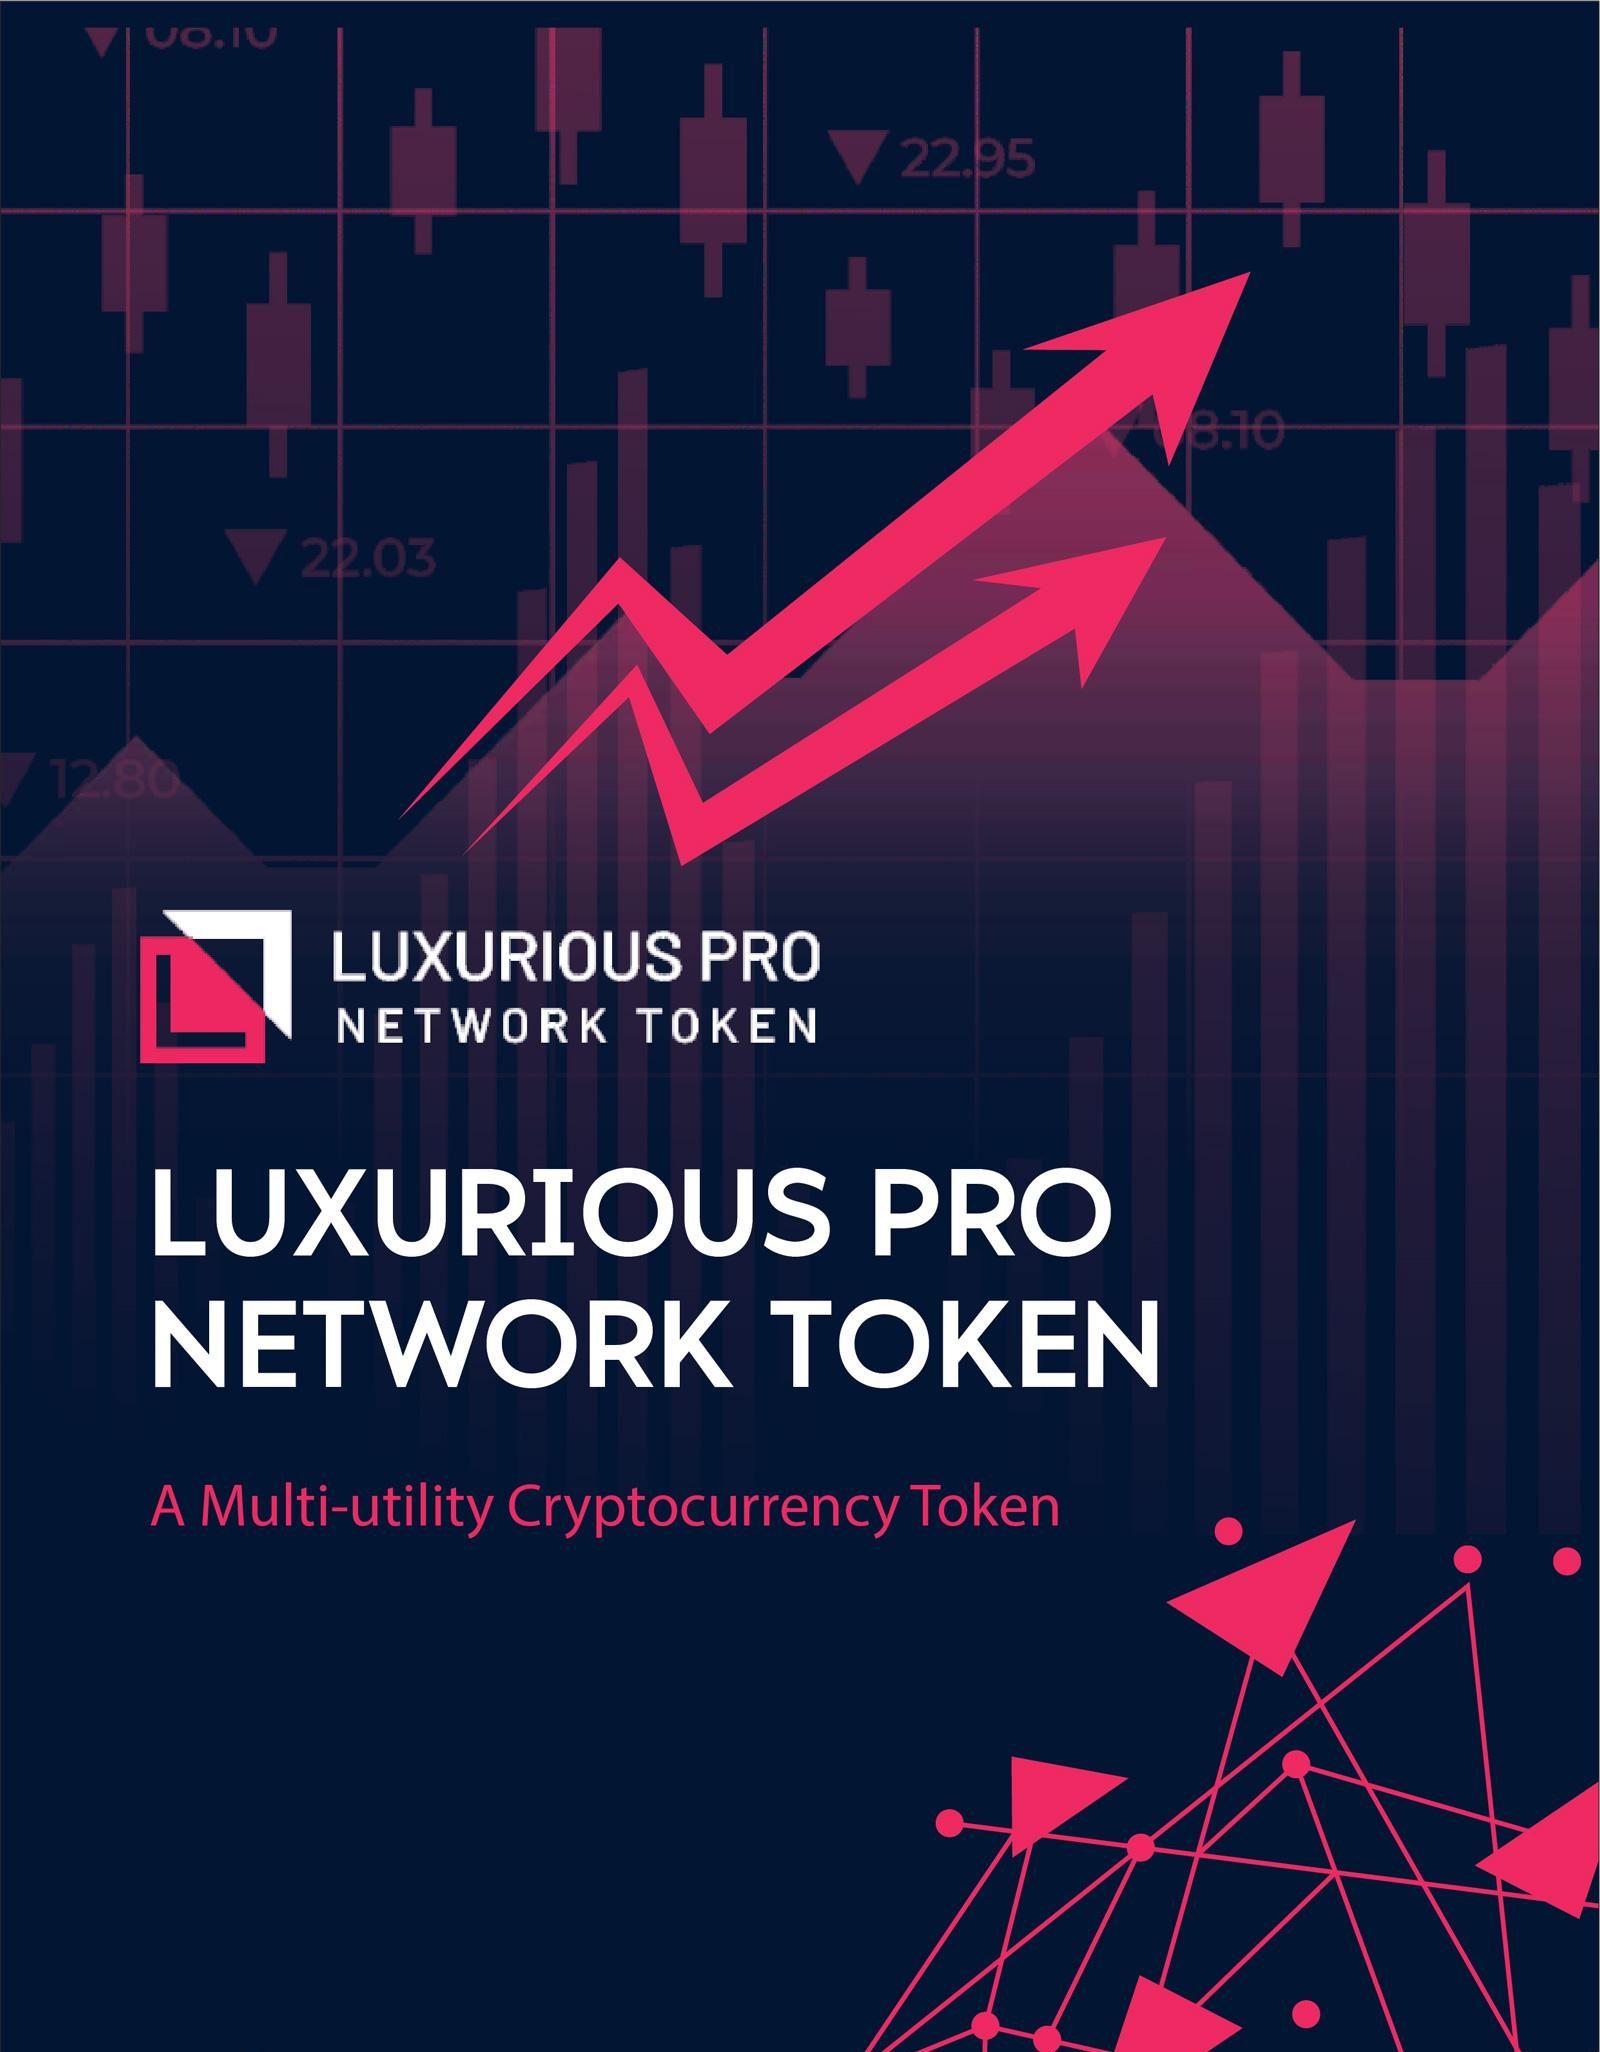 LUXURIOUS PRO NETWORK TOKEN GROUP